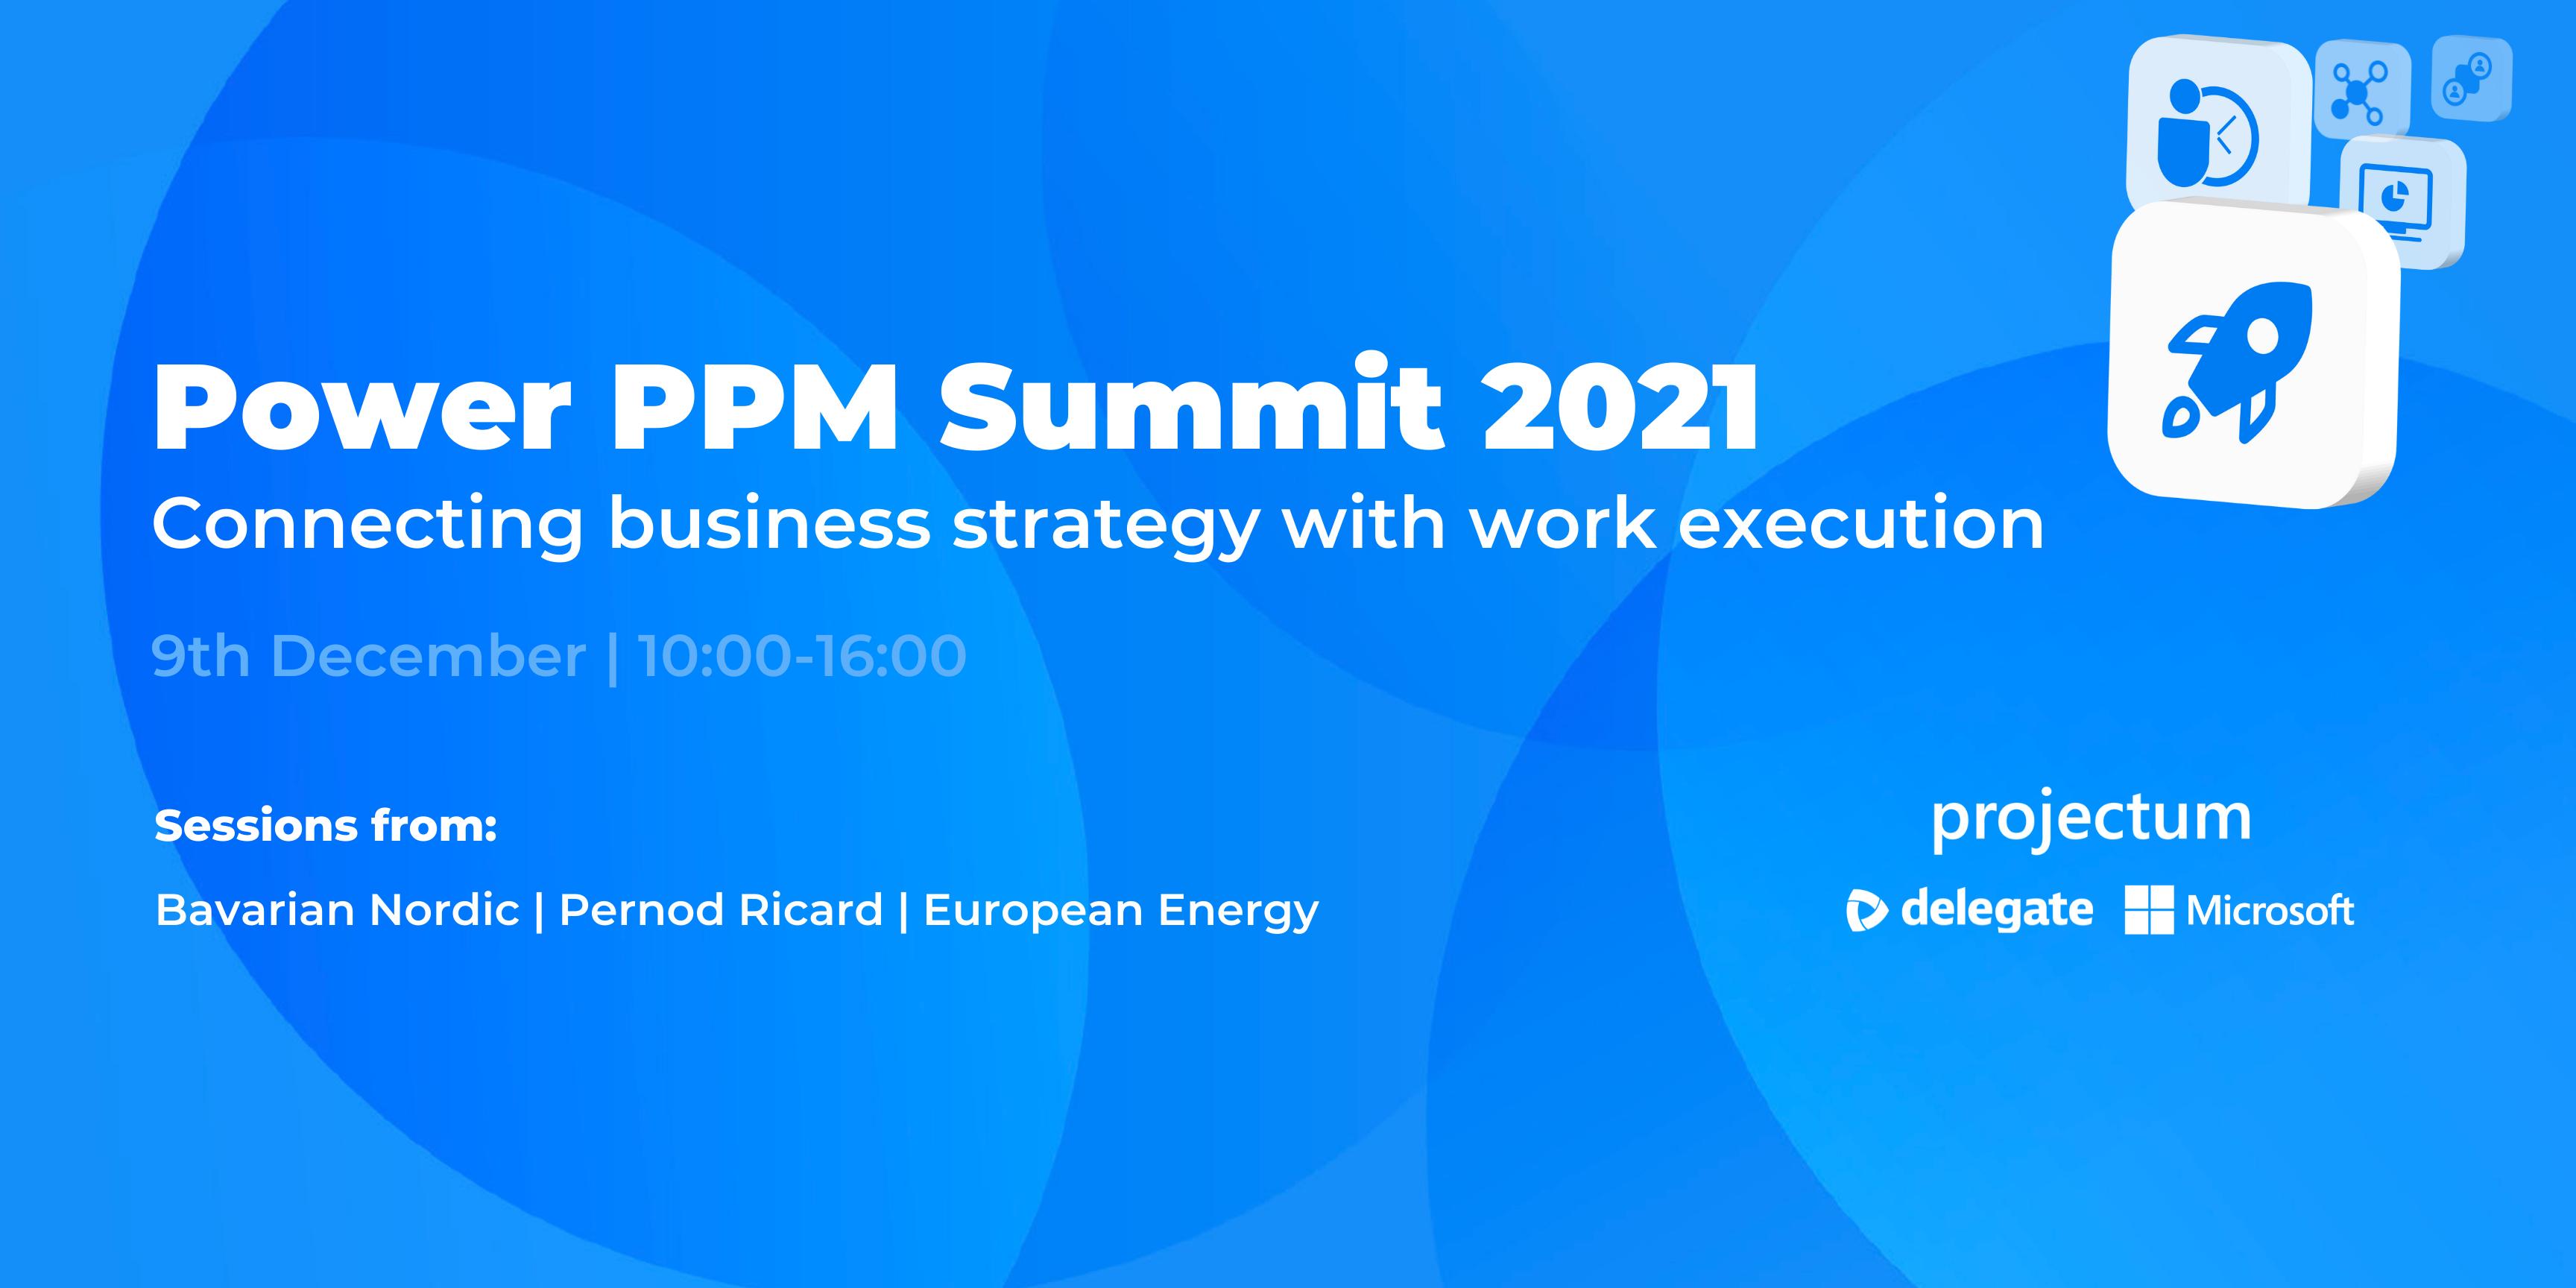 Power PPM summit 21